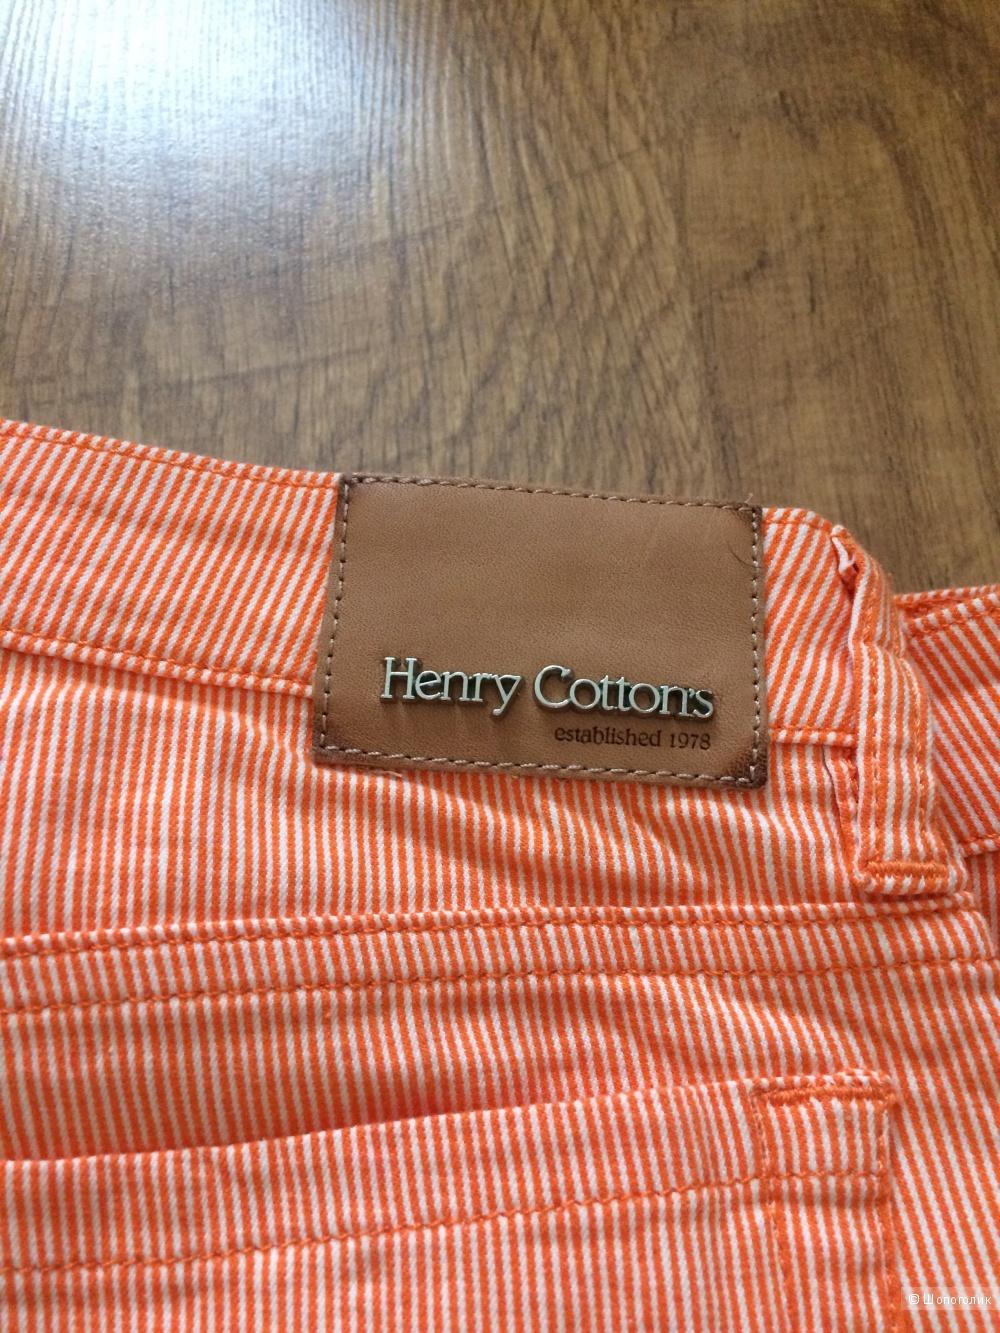 Джинсы Henry Cottons р.46-48